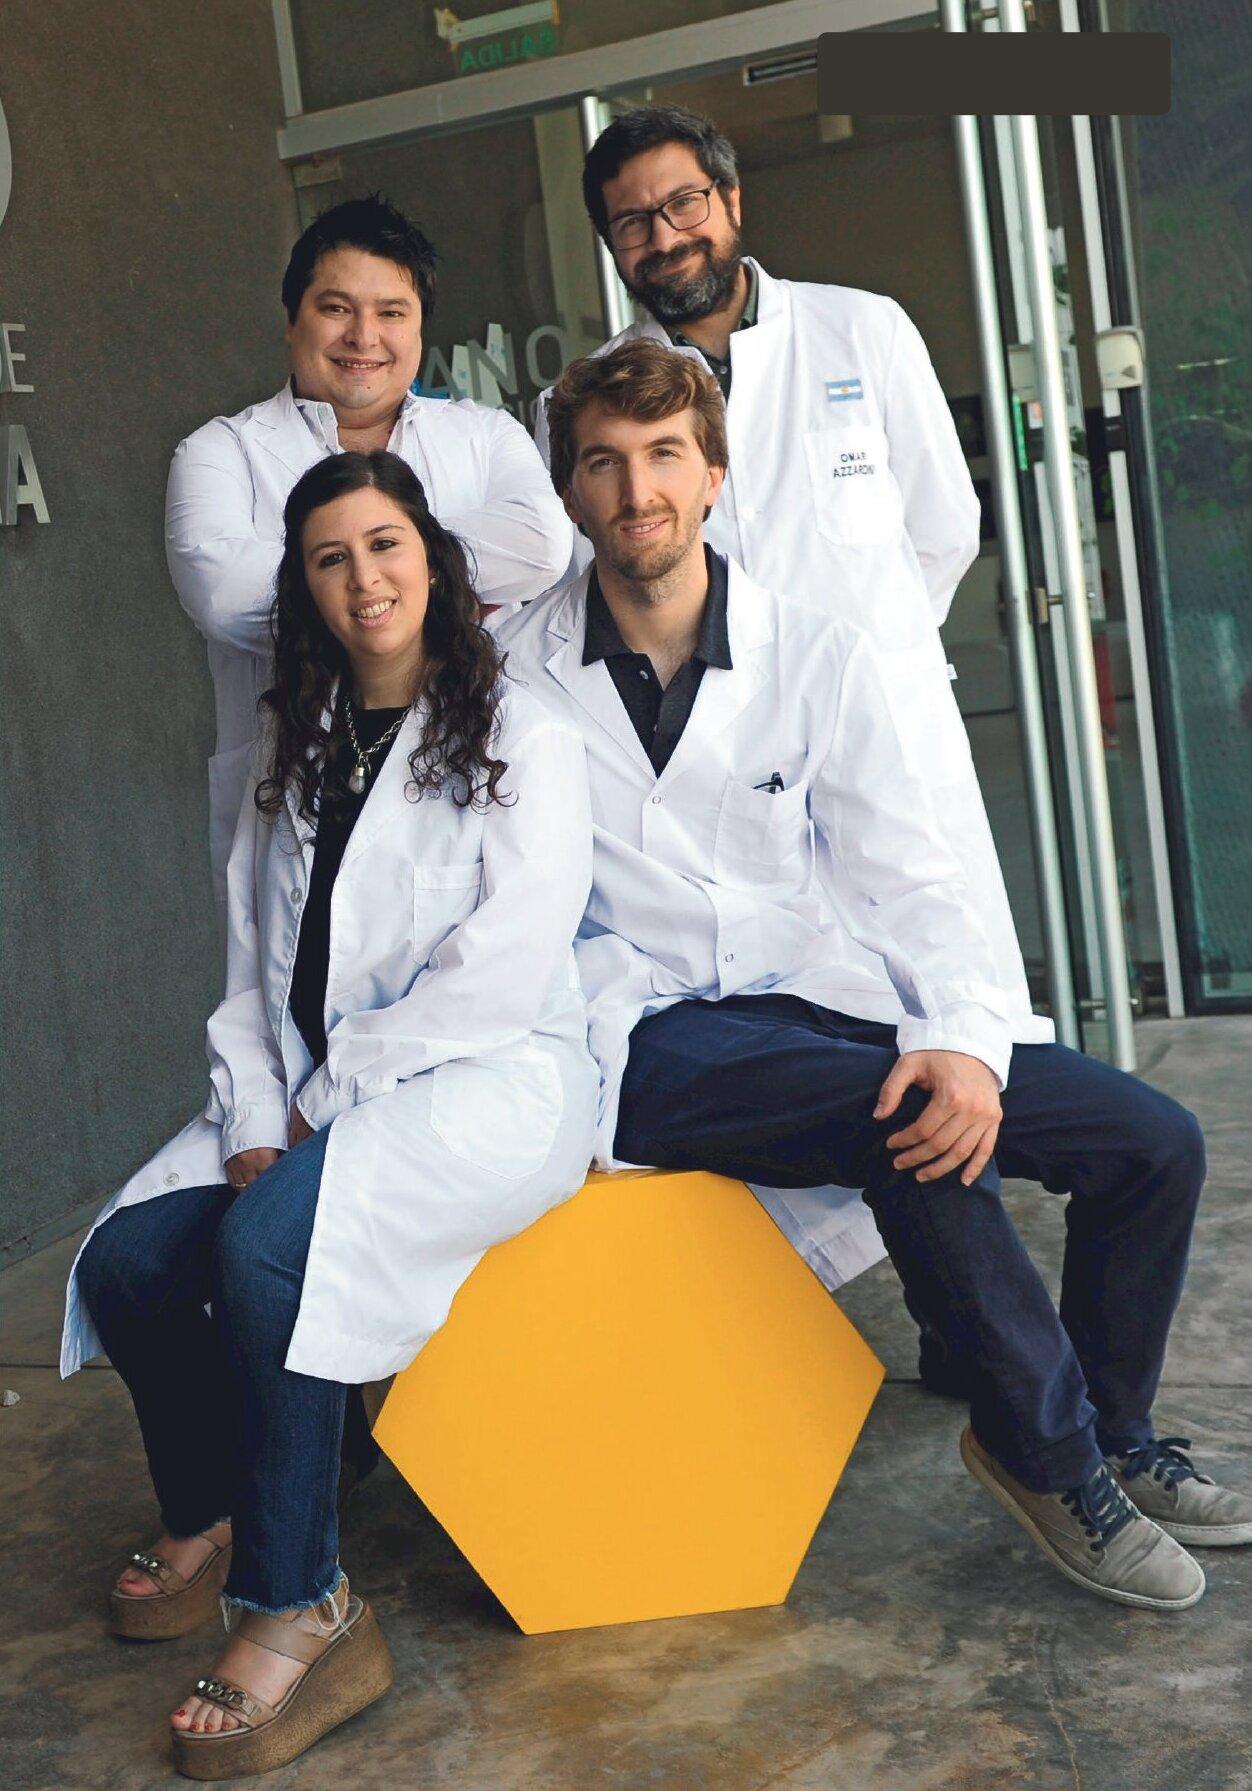 Gisens Biotech